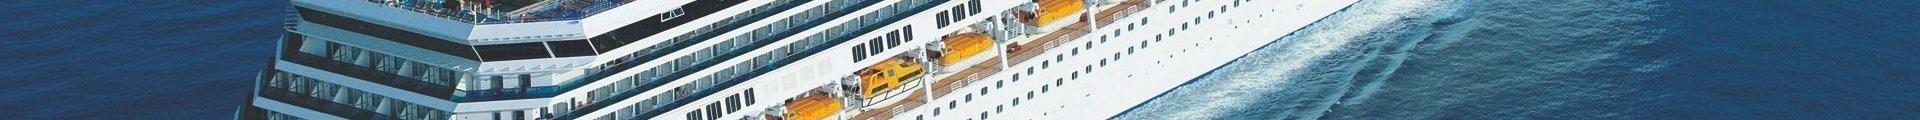 Cruise banner